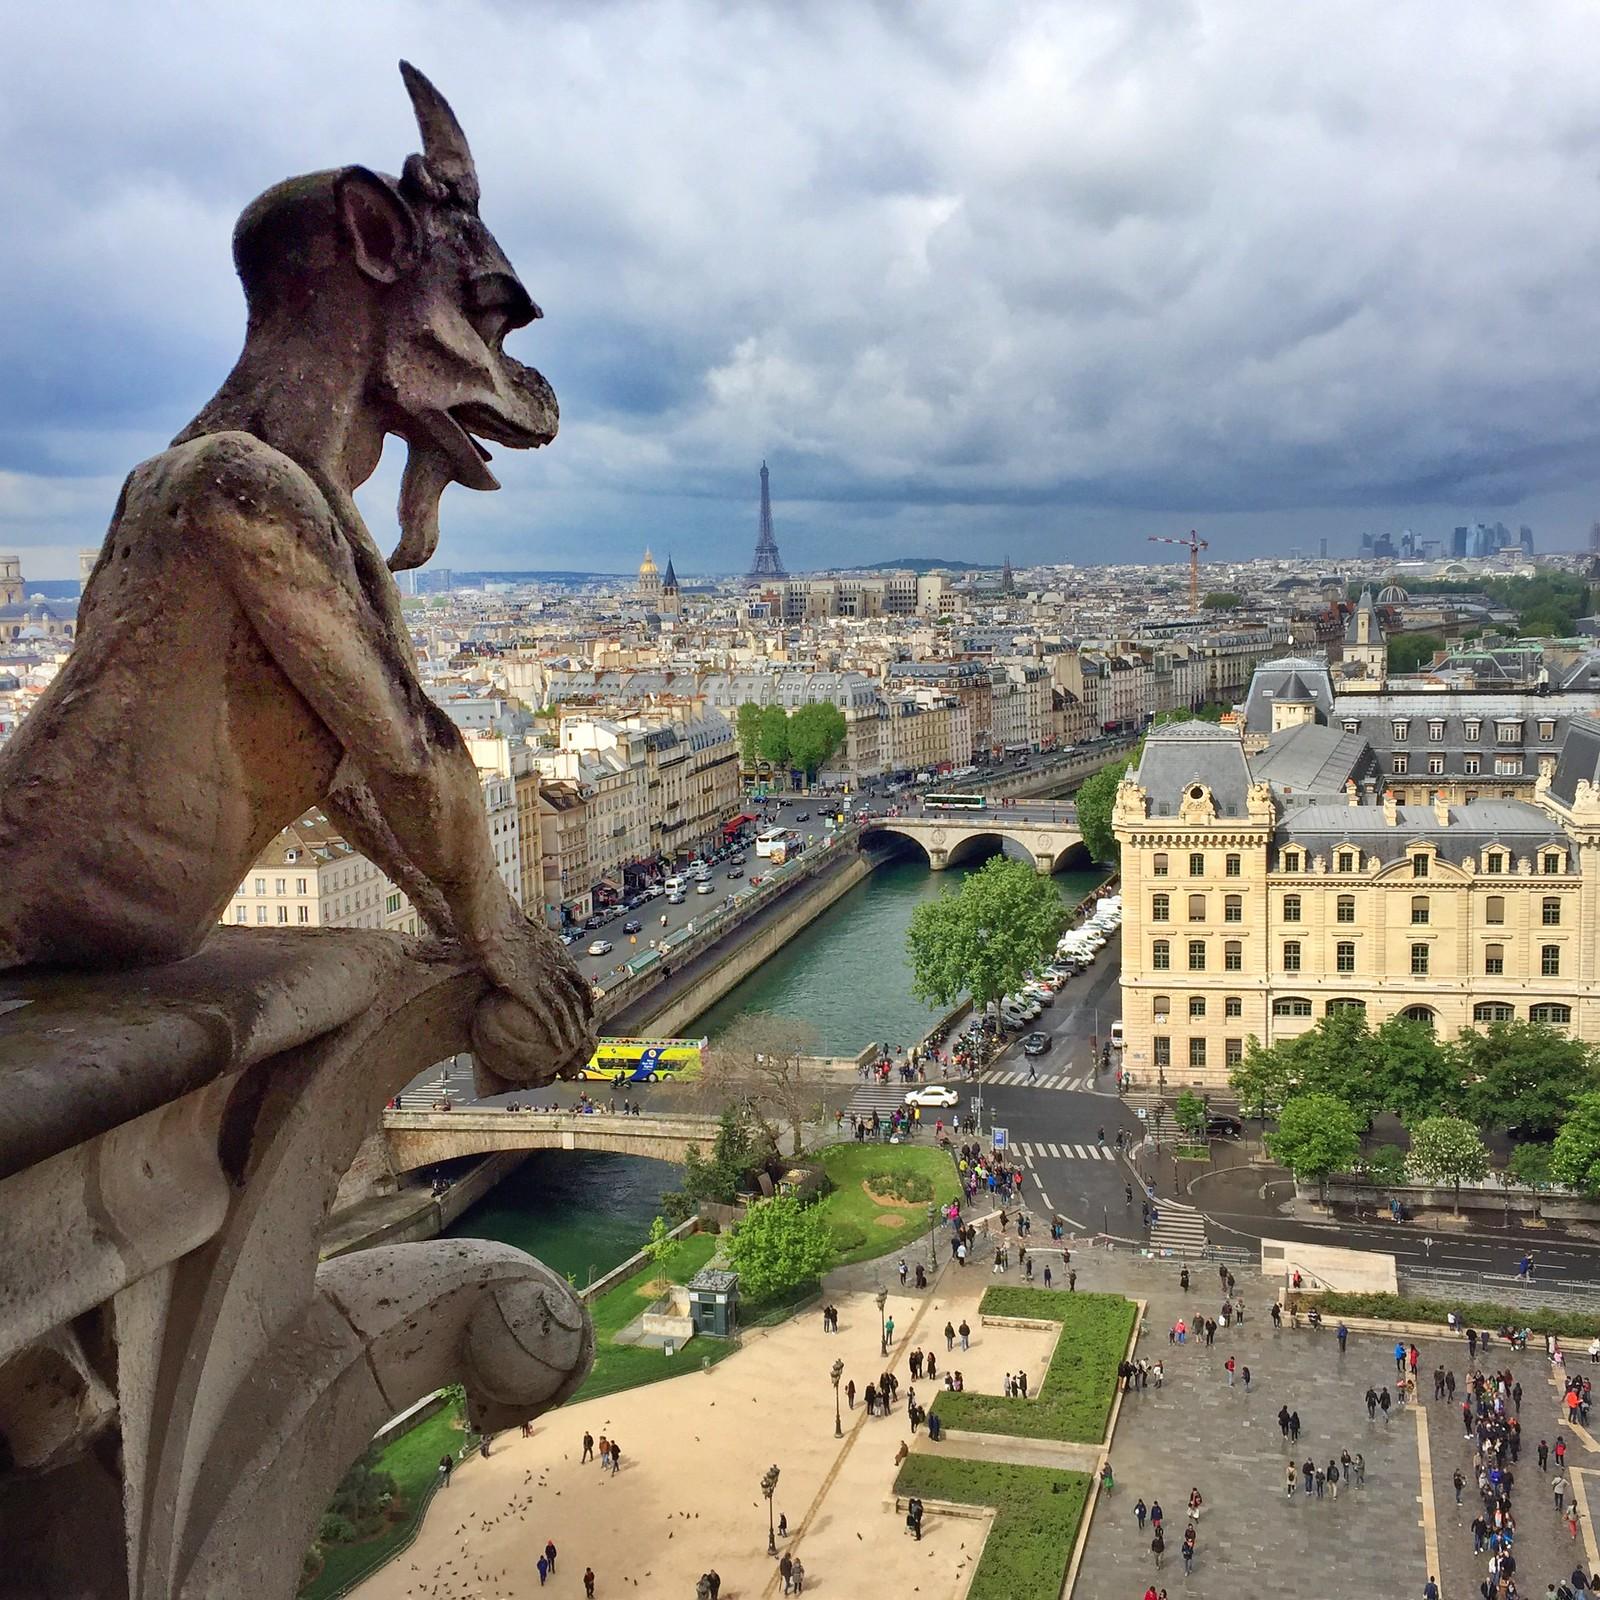 Viajar a Paris con Perro viajar a paris con perro - 34215580300 07930bcf87 h - Viajar a Paris con perro